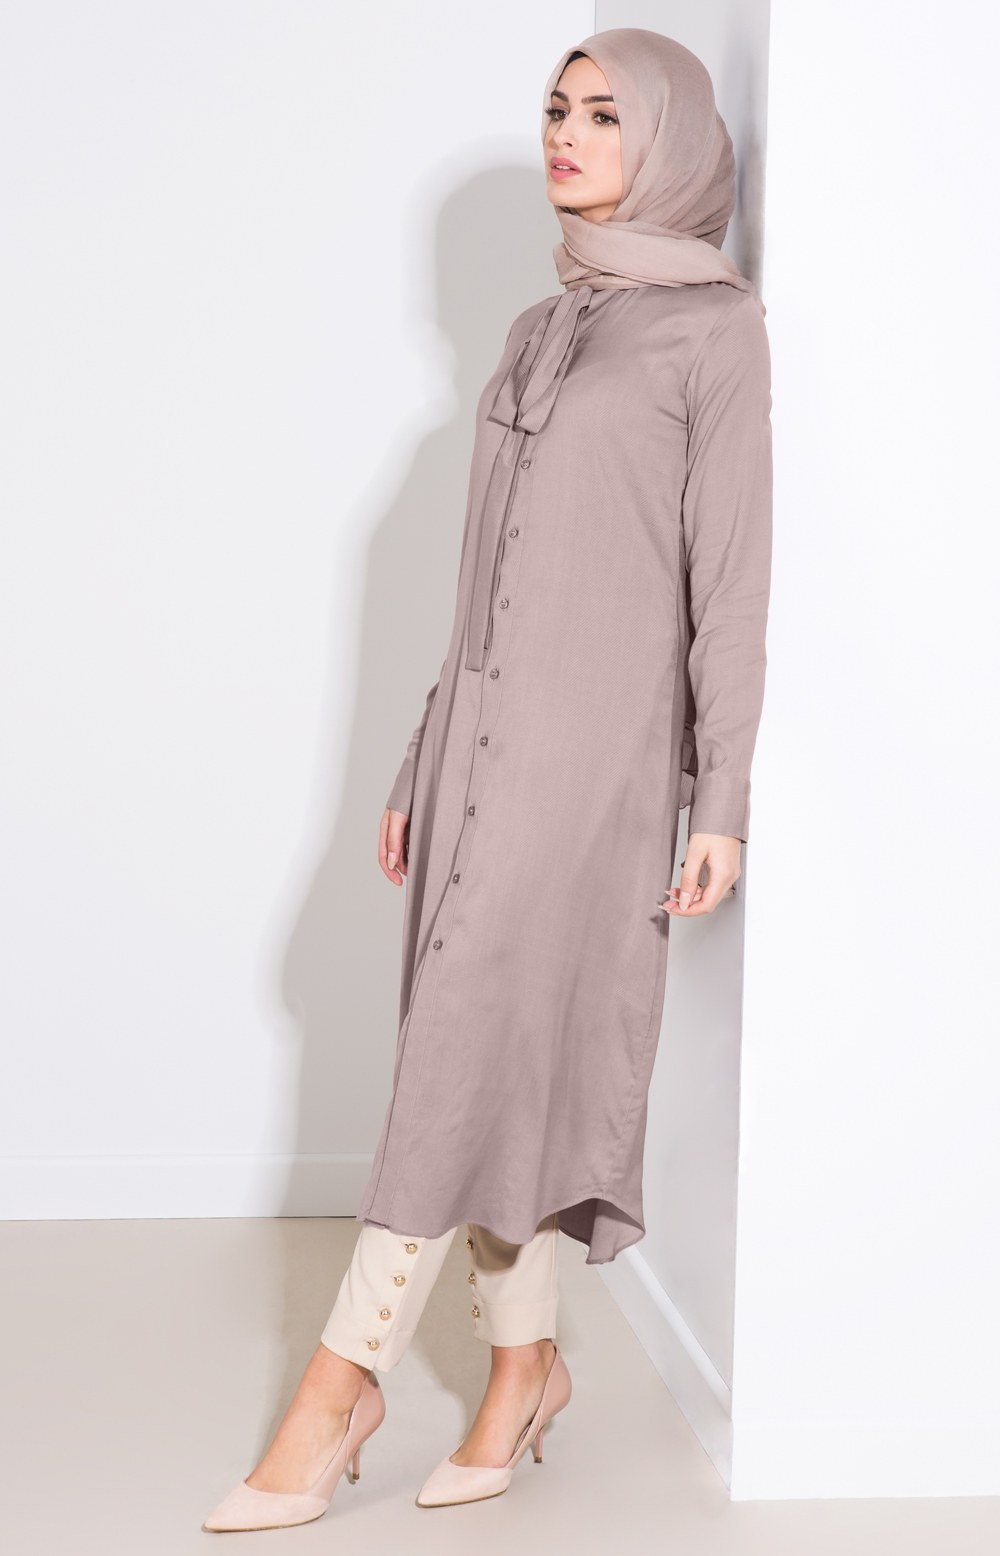 Bentuk Baju Lebaran 2016 Ipdd 25 Trend Model Baju Muslim Lebaran 2018 Simple & Modis